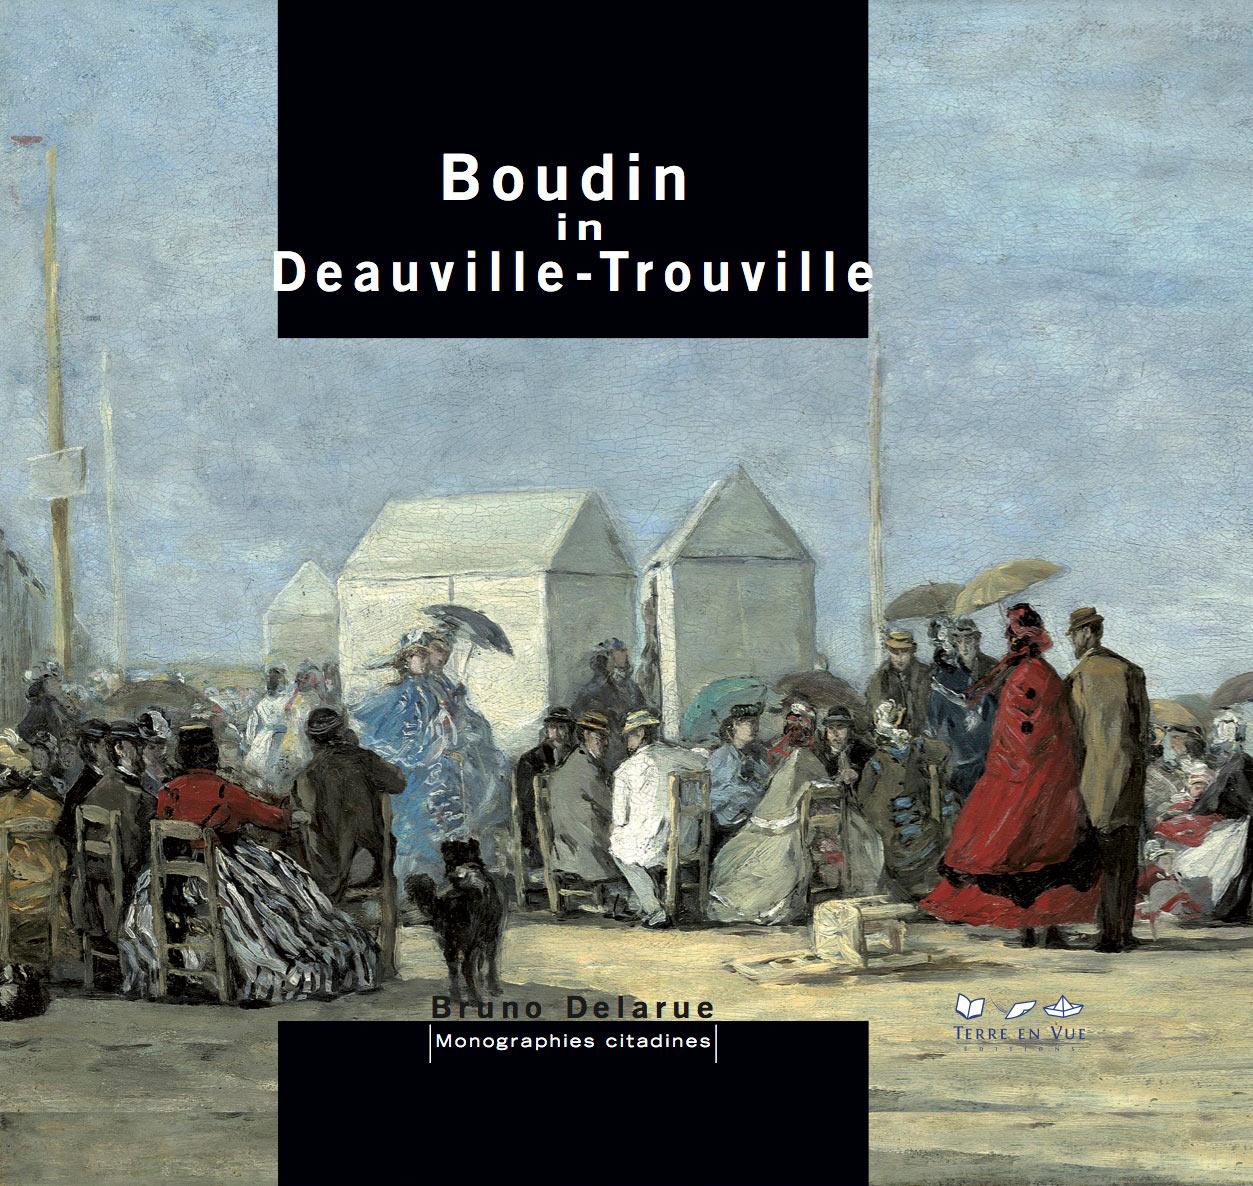 Boudin in Deauville-Trouville